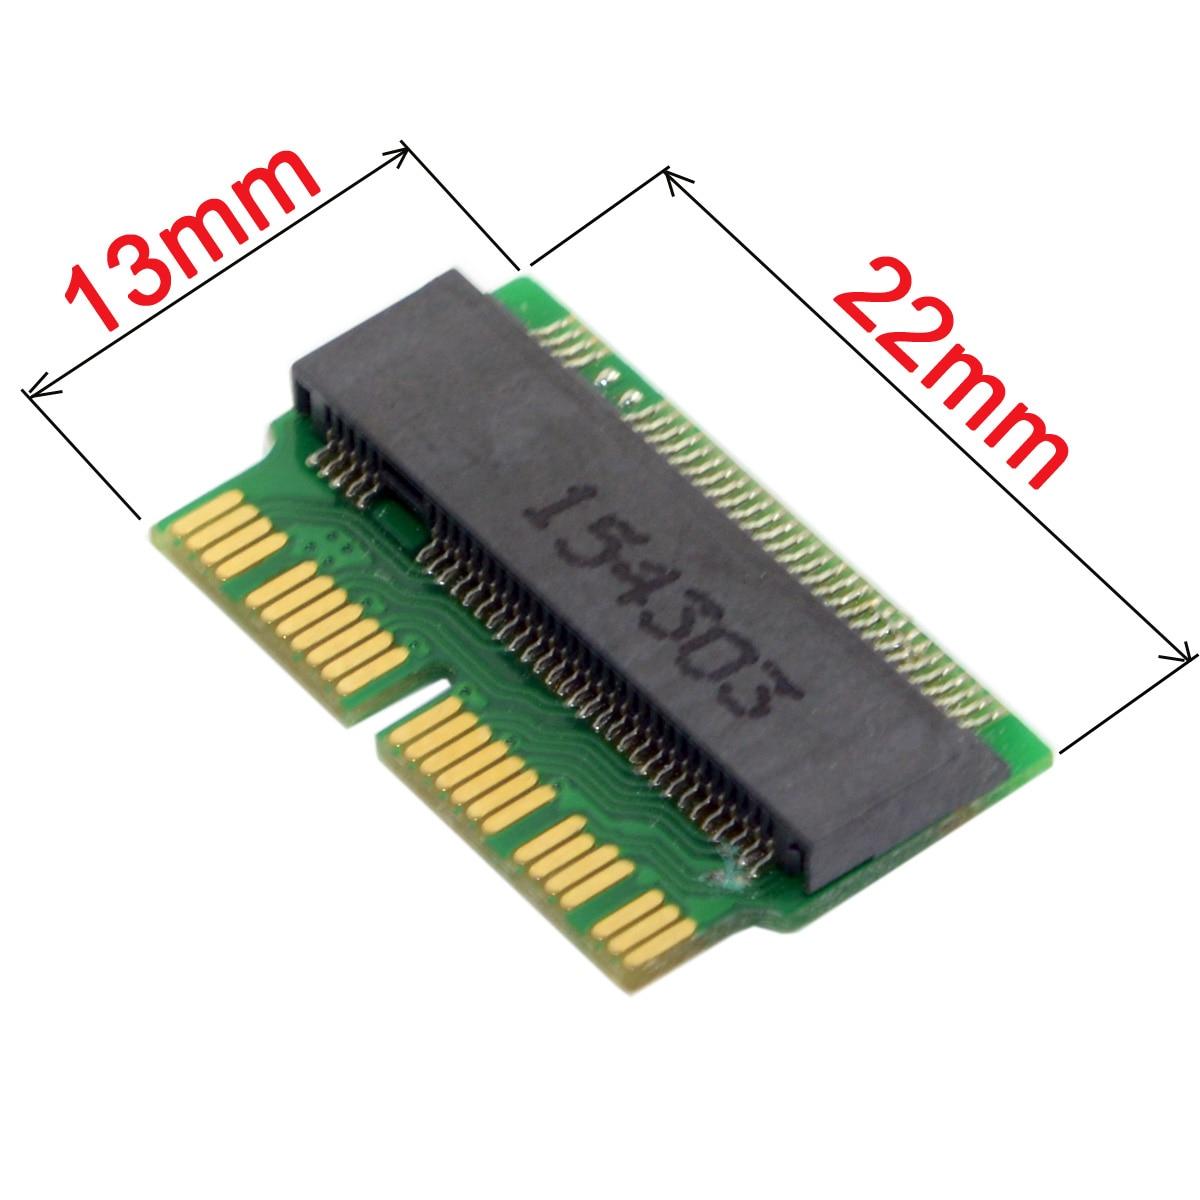 12 + 16pin 2014 2015 mac para m.2 ngff m-chave ahci ssd converter cartão para a1465 a1466 a1493 a1502